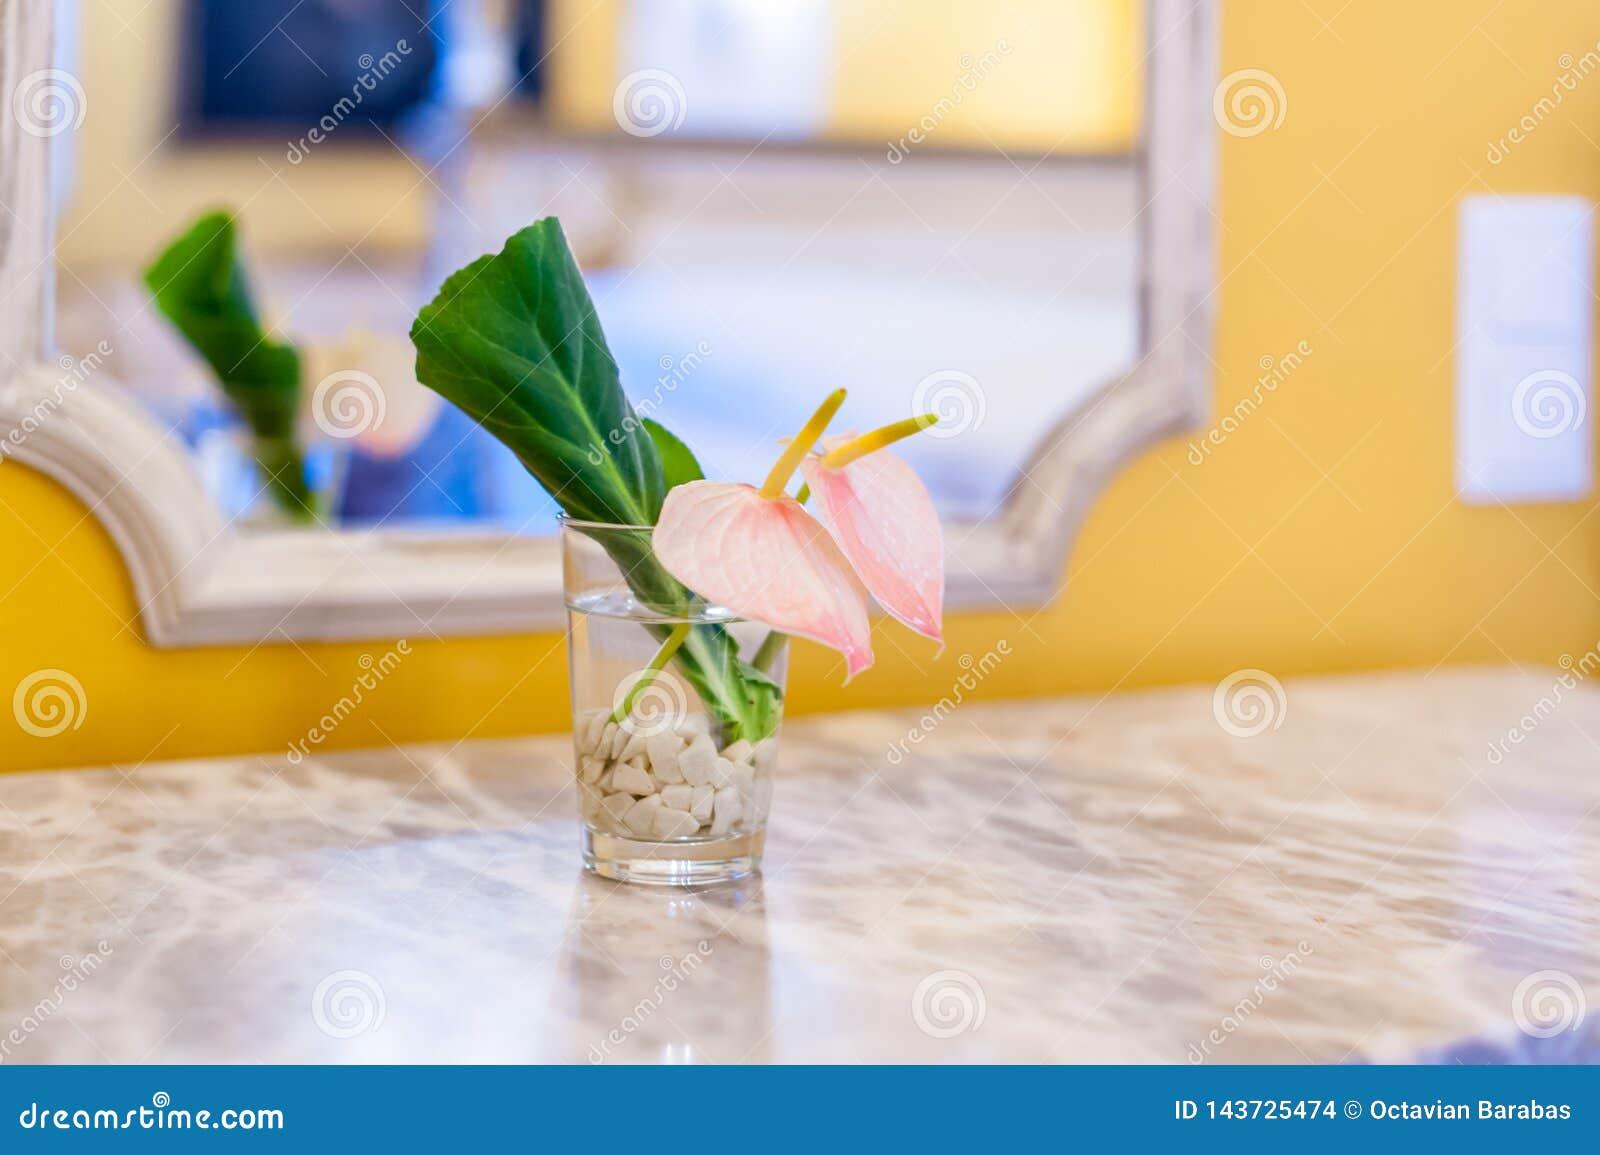 Roze bloem en groen blad in klein transparant glas